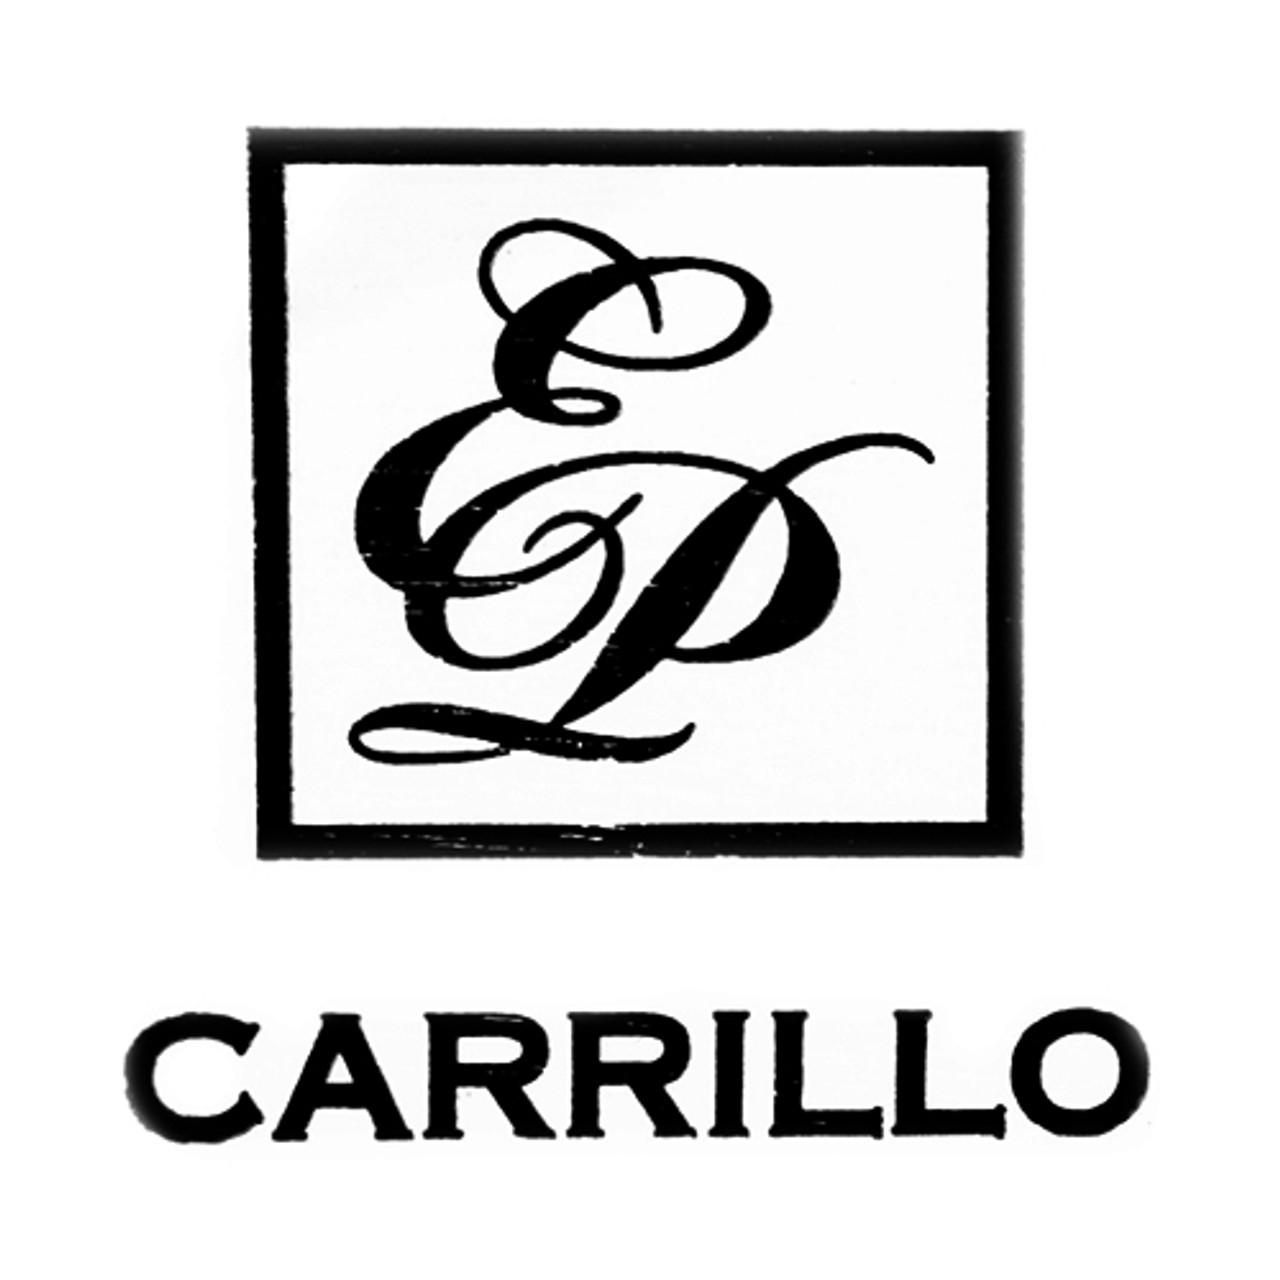 E.P. Carrillo Seleccion Oscuro Robusto Gordo Cigars - 5 x 54 (Box of 24)